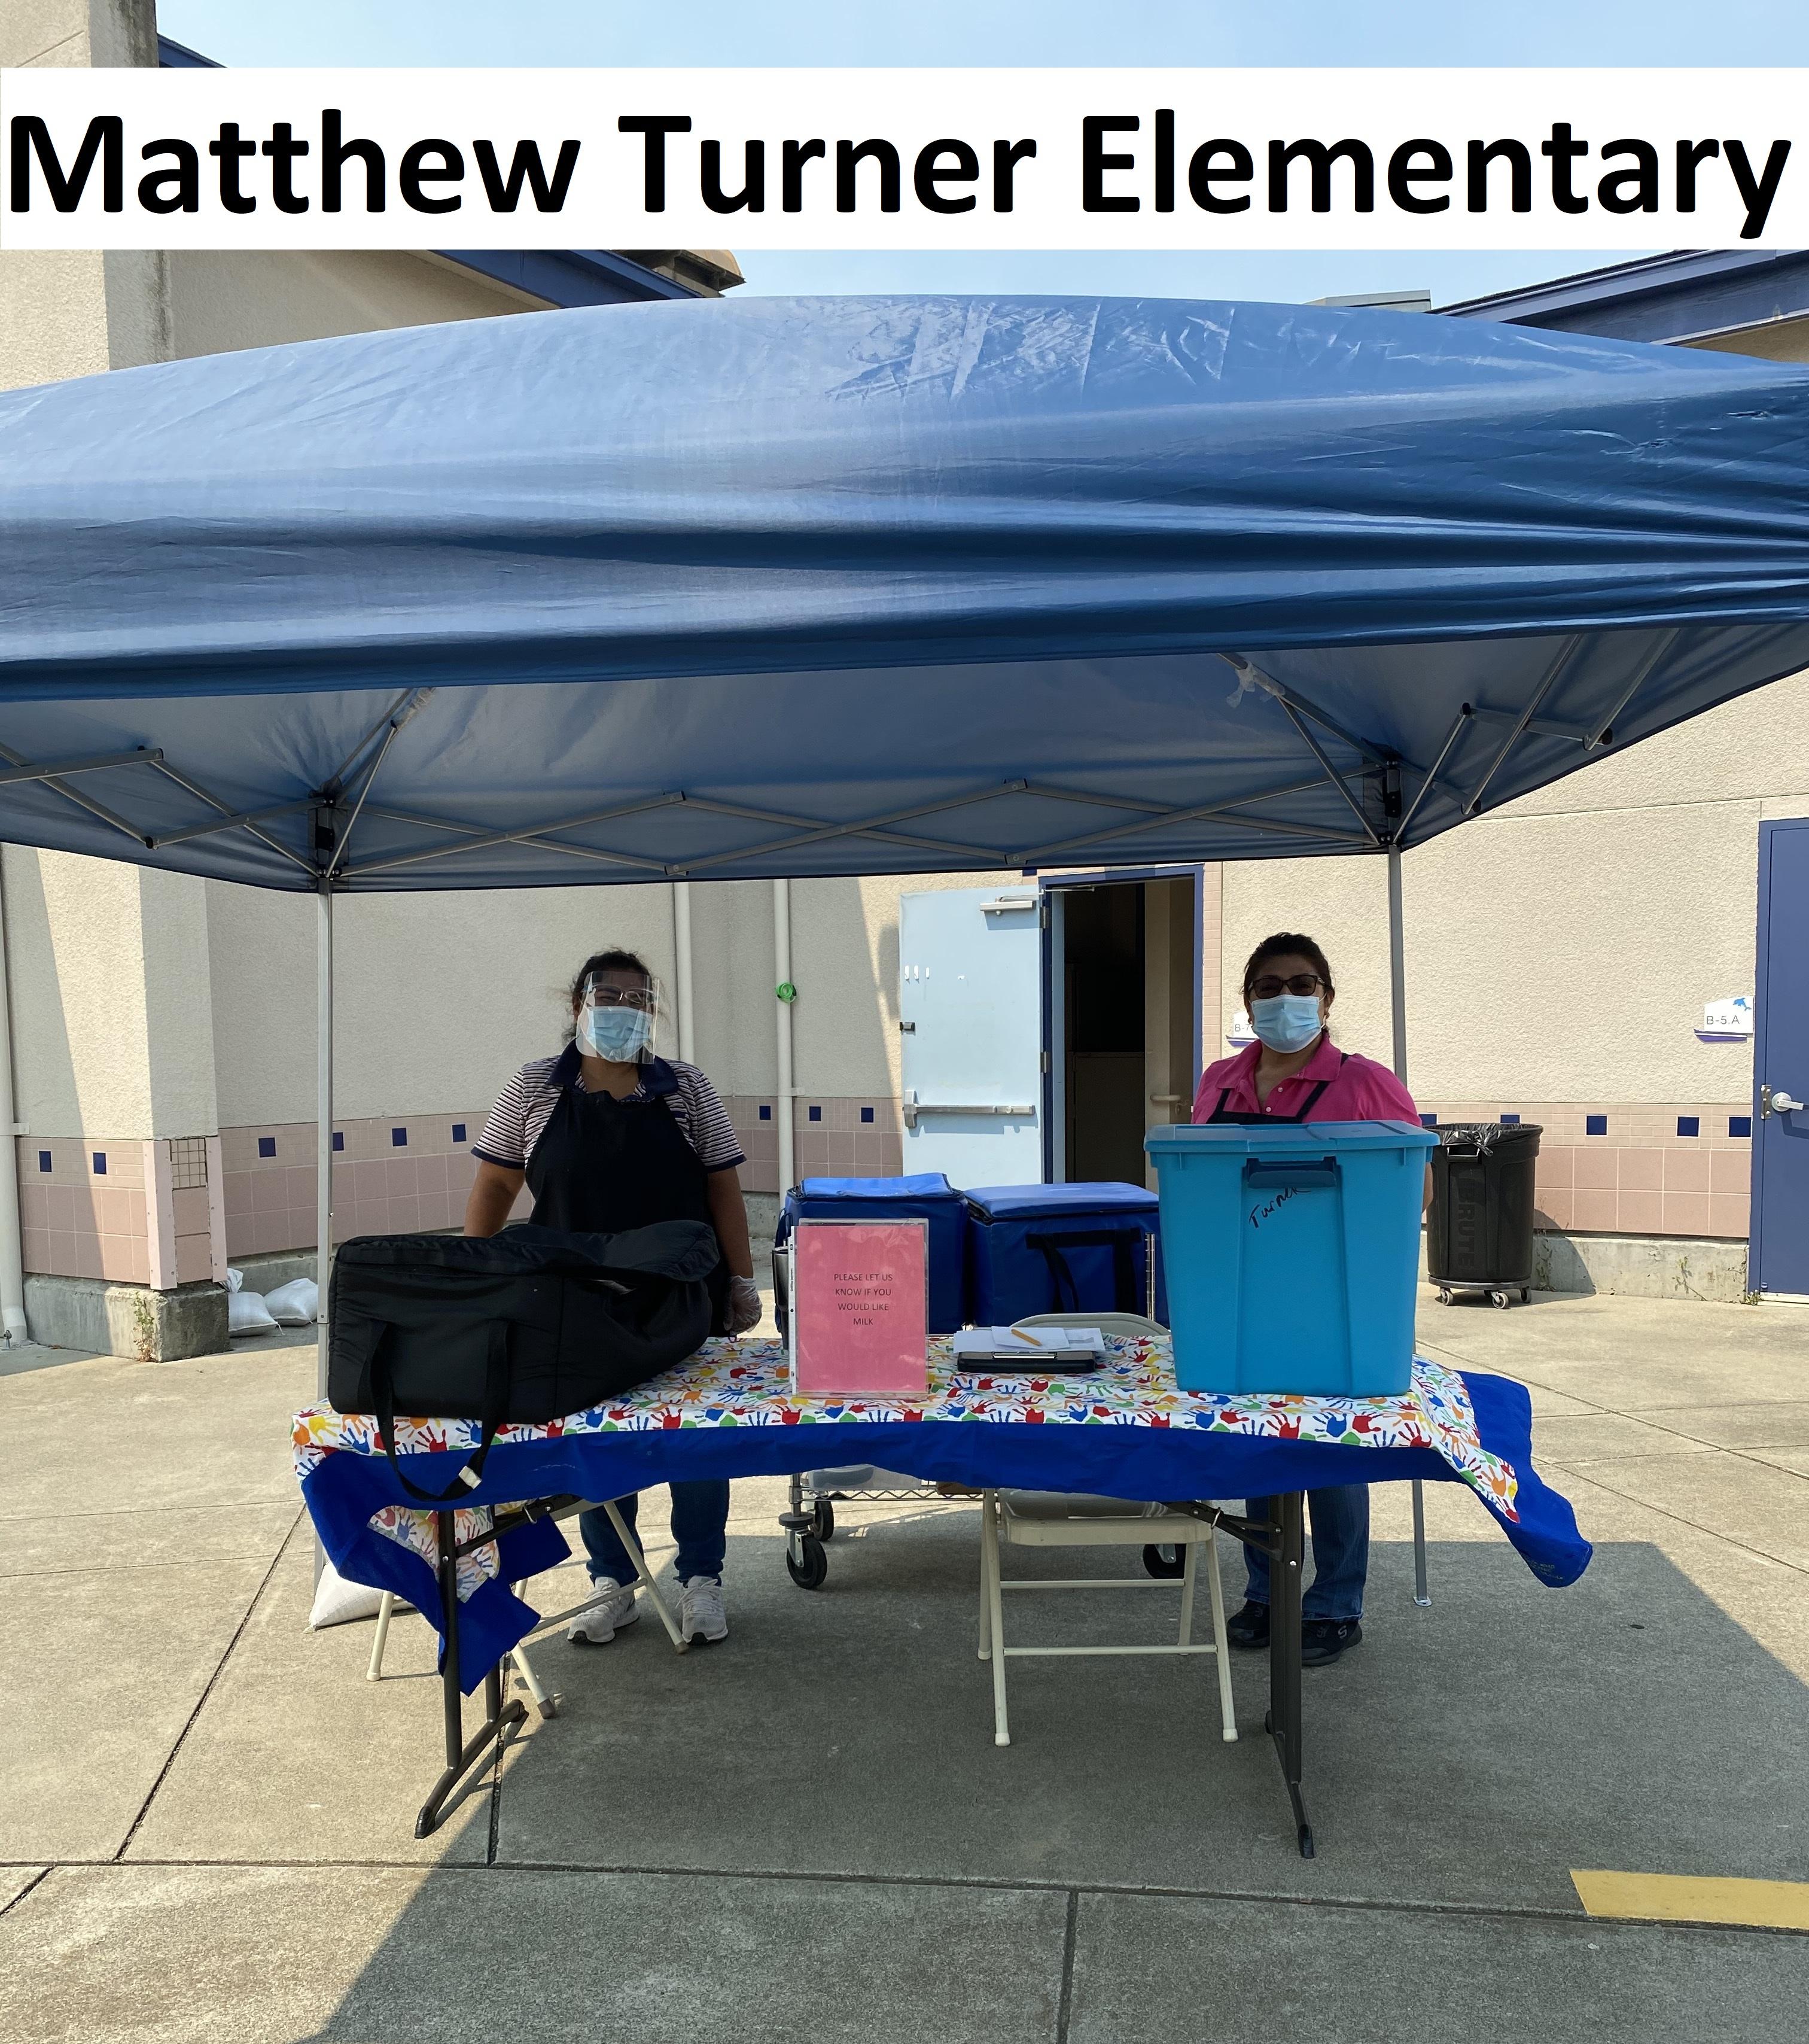 Matthew Turner Elementary Picture.jpg